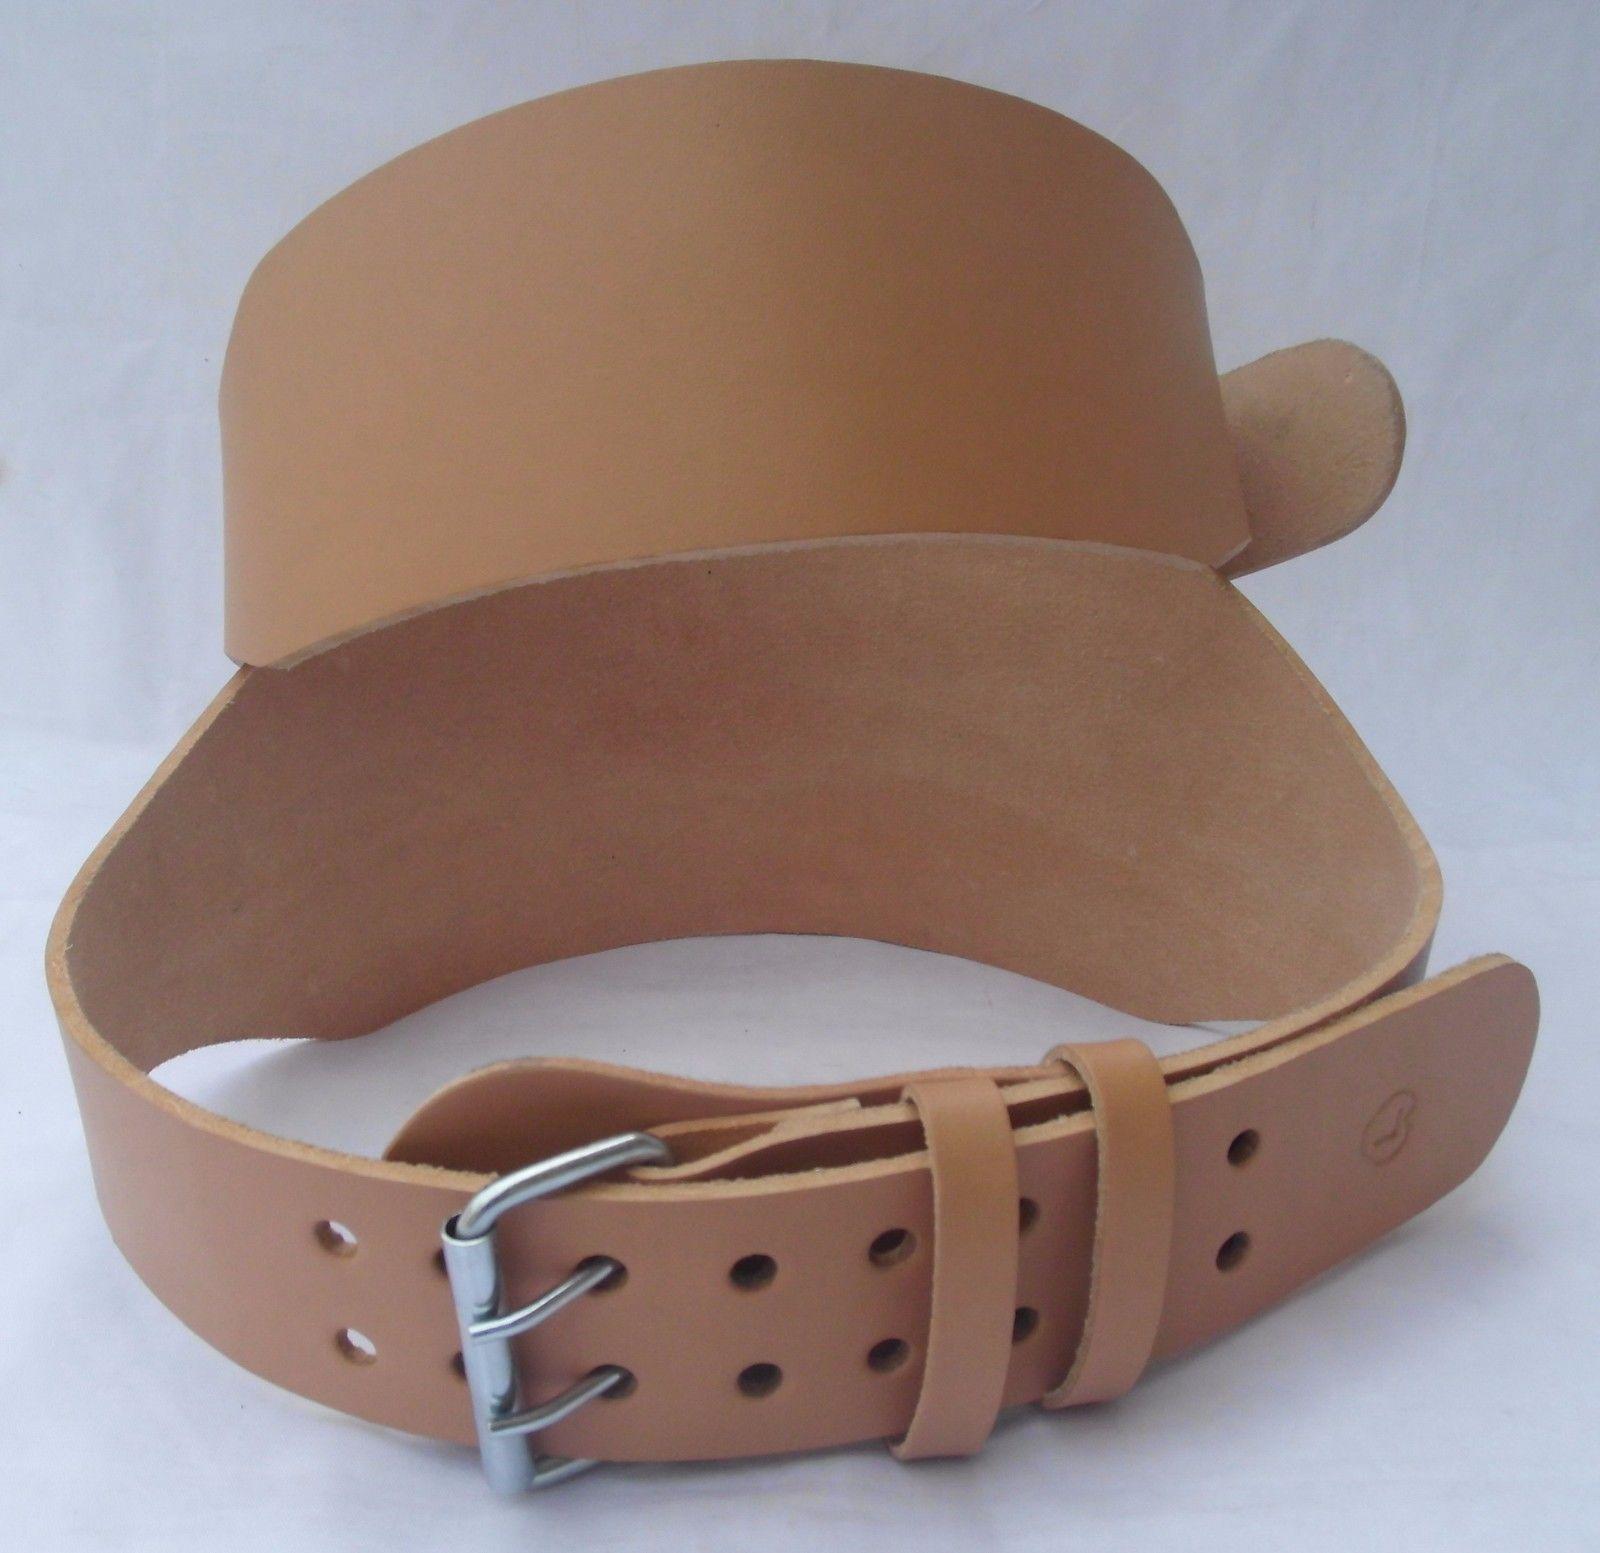 e691dafbb5 Belts 36155  Basic Leather Weightlifting Belt - Powerlifting Belt ...